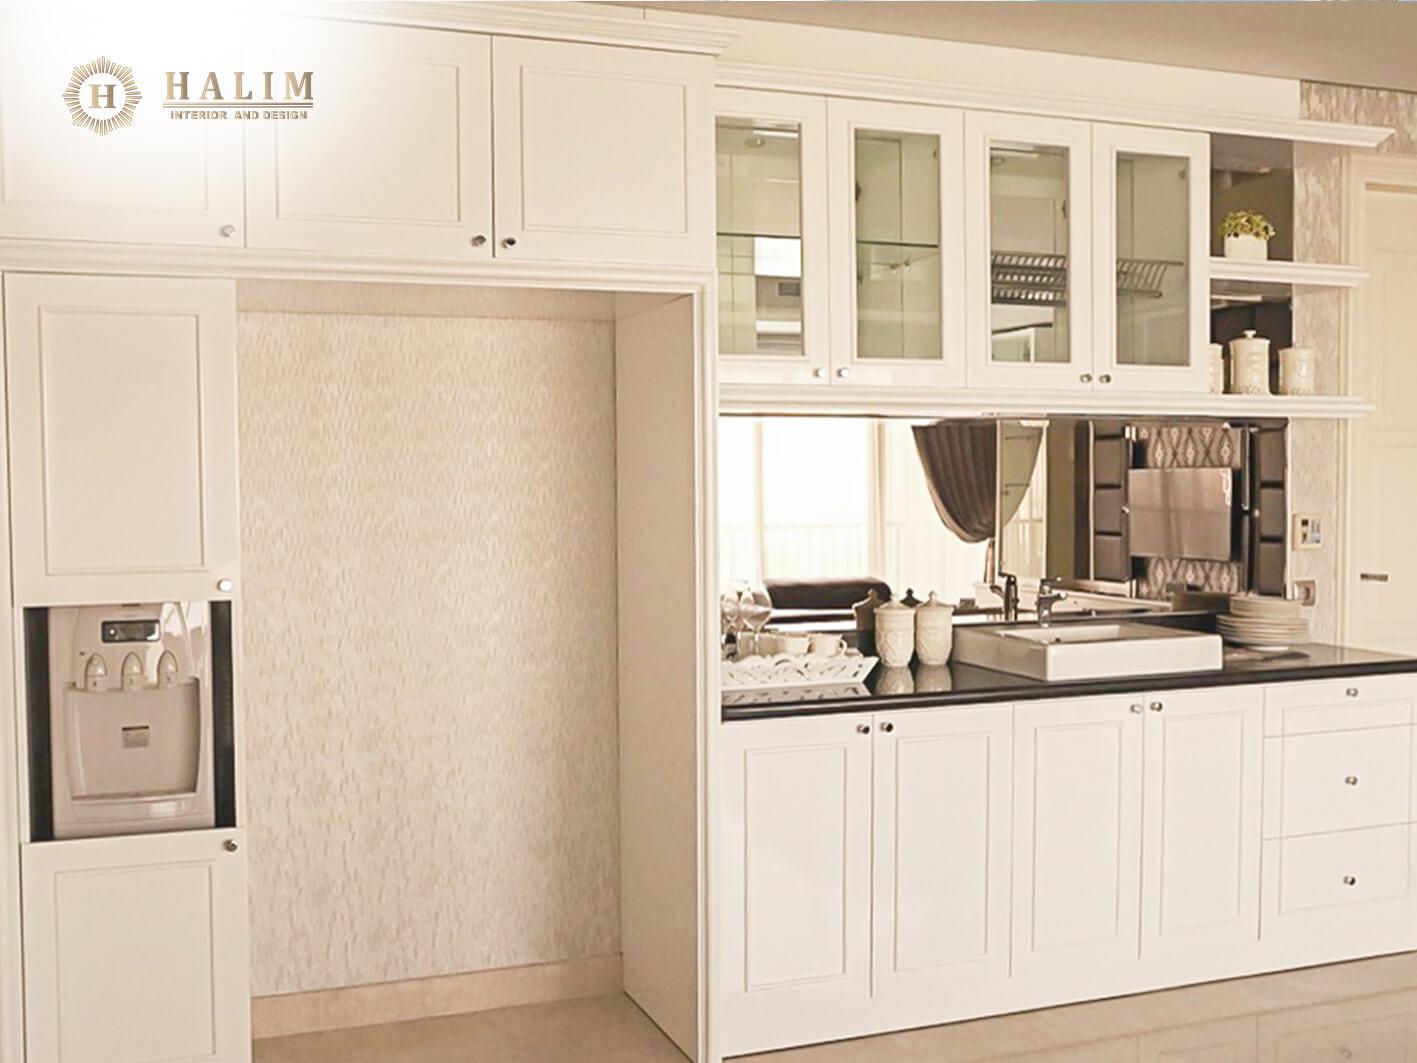 Halim, Interior, modern, furniture, contemporer american style, minimalist, european, classic, surabaya, Lenmarc Adhiwangsa, 3a1a